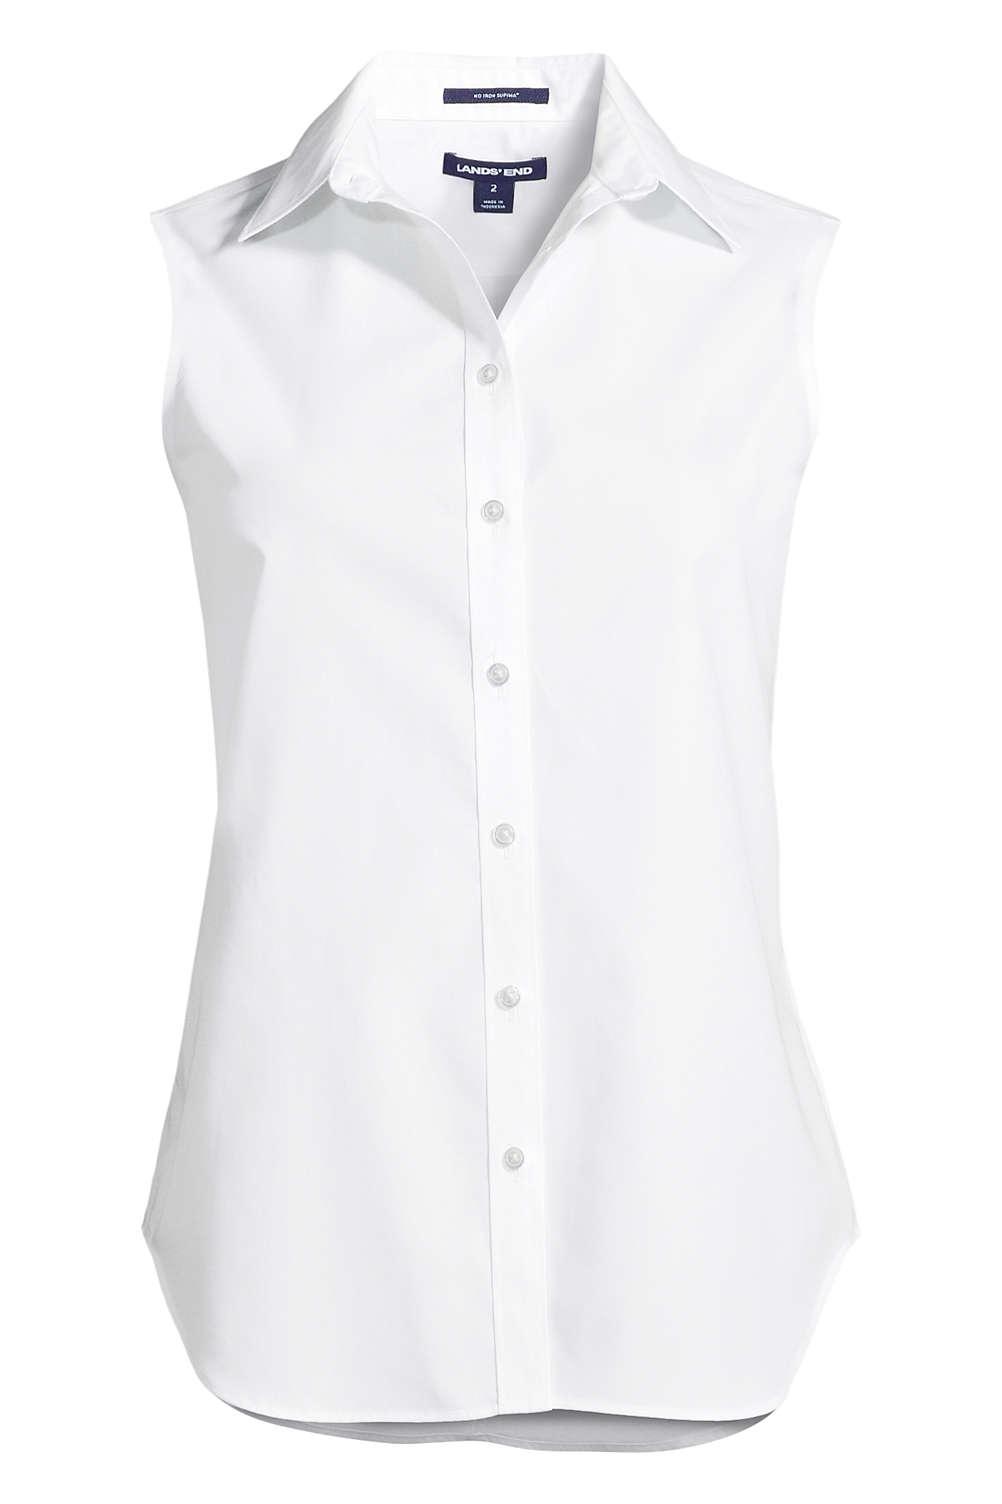 99fb3eddadeb4 Women s Sleeveless No Iron Shirt from Lands  End